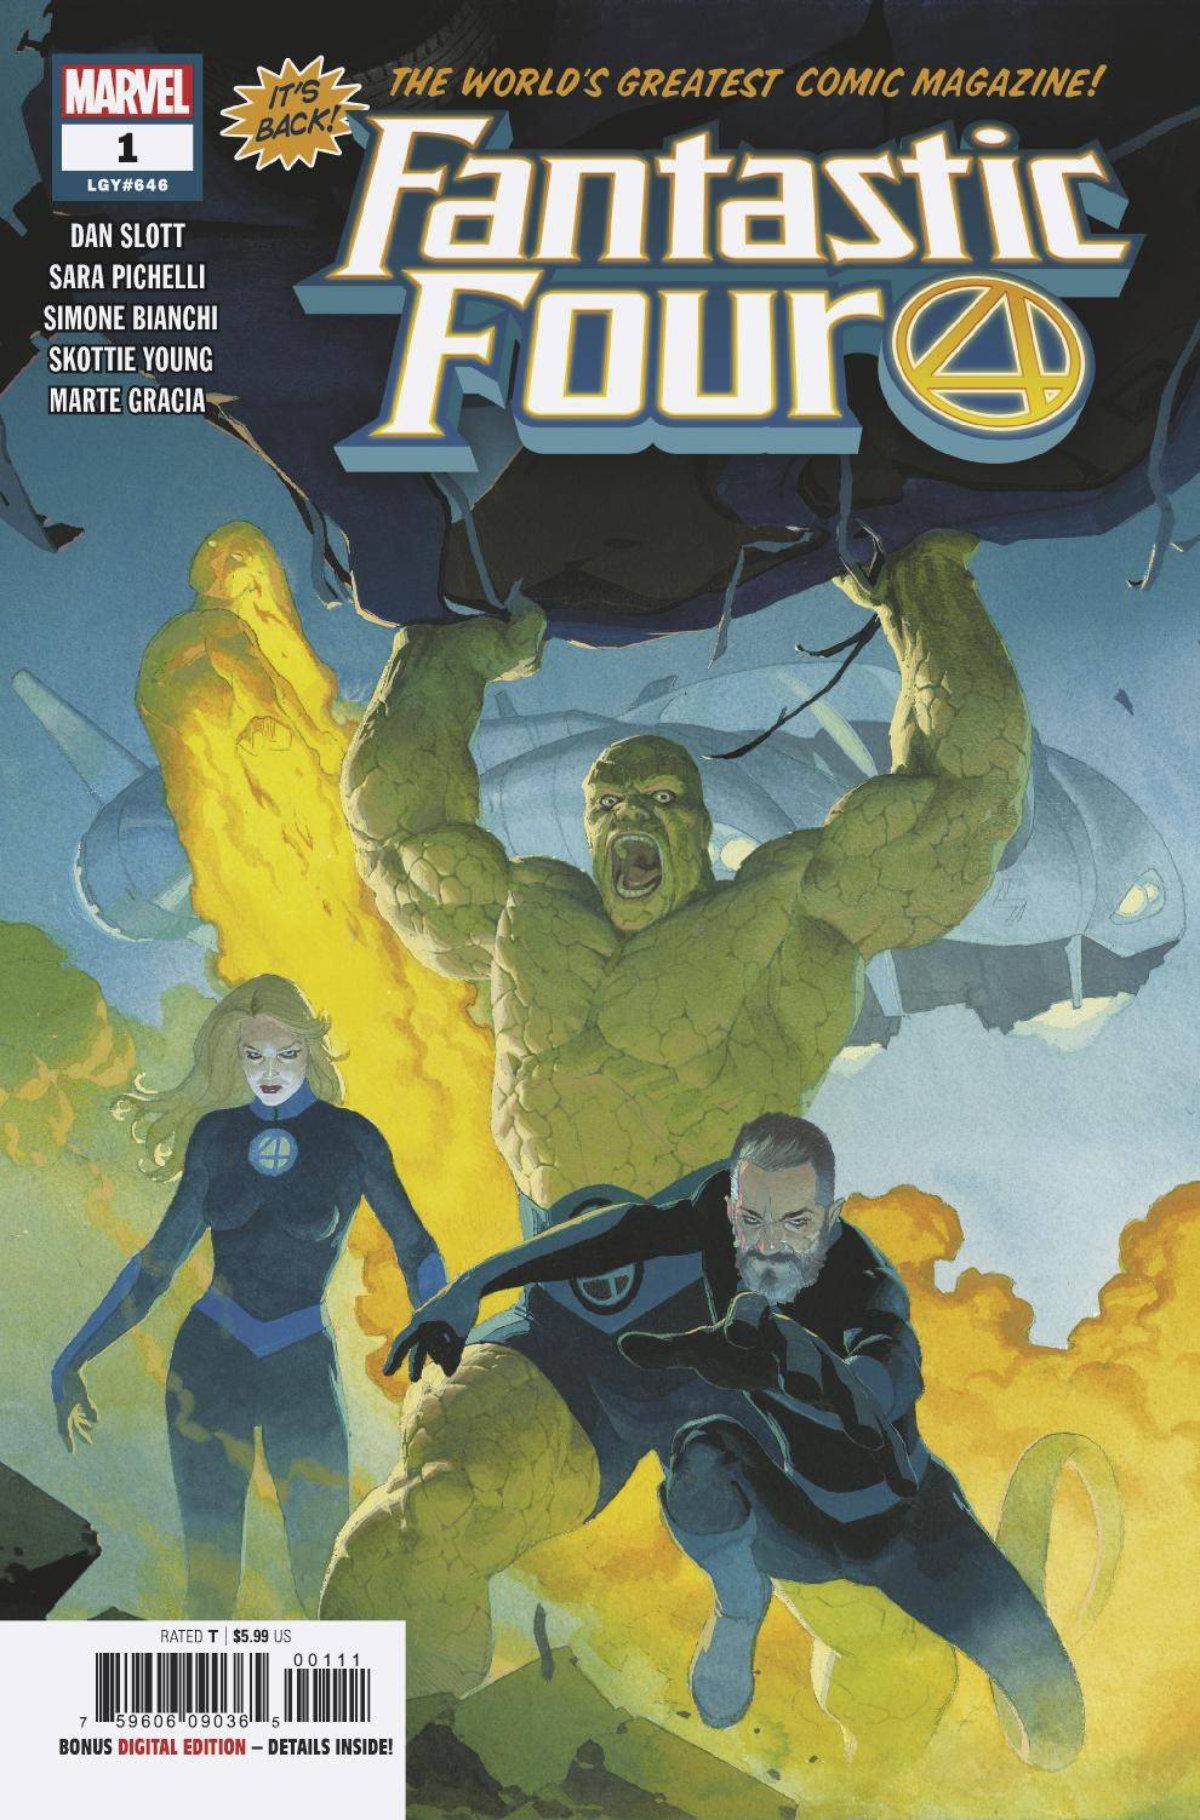 Fantastic Four #1, 2018